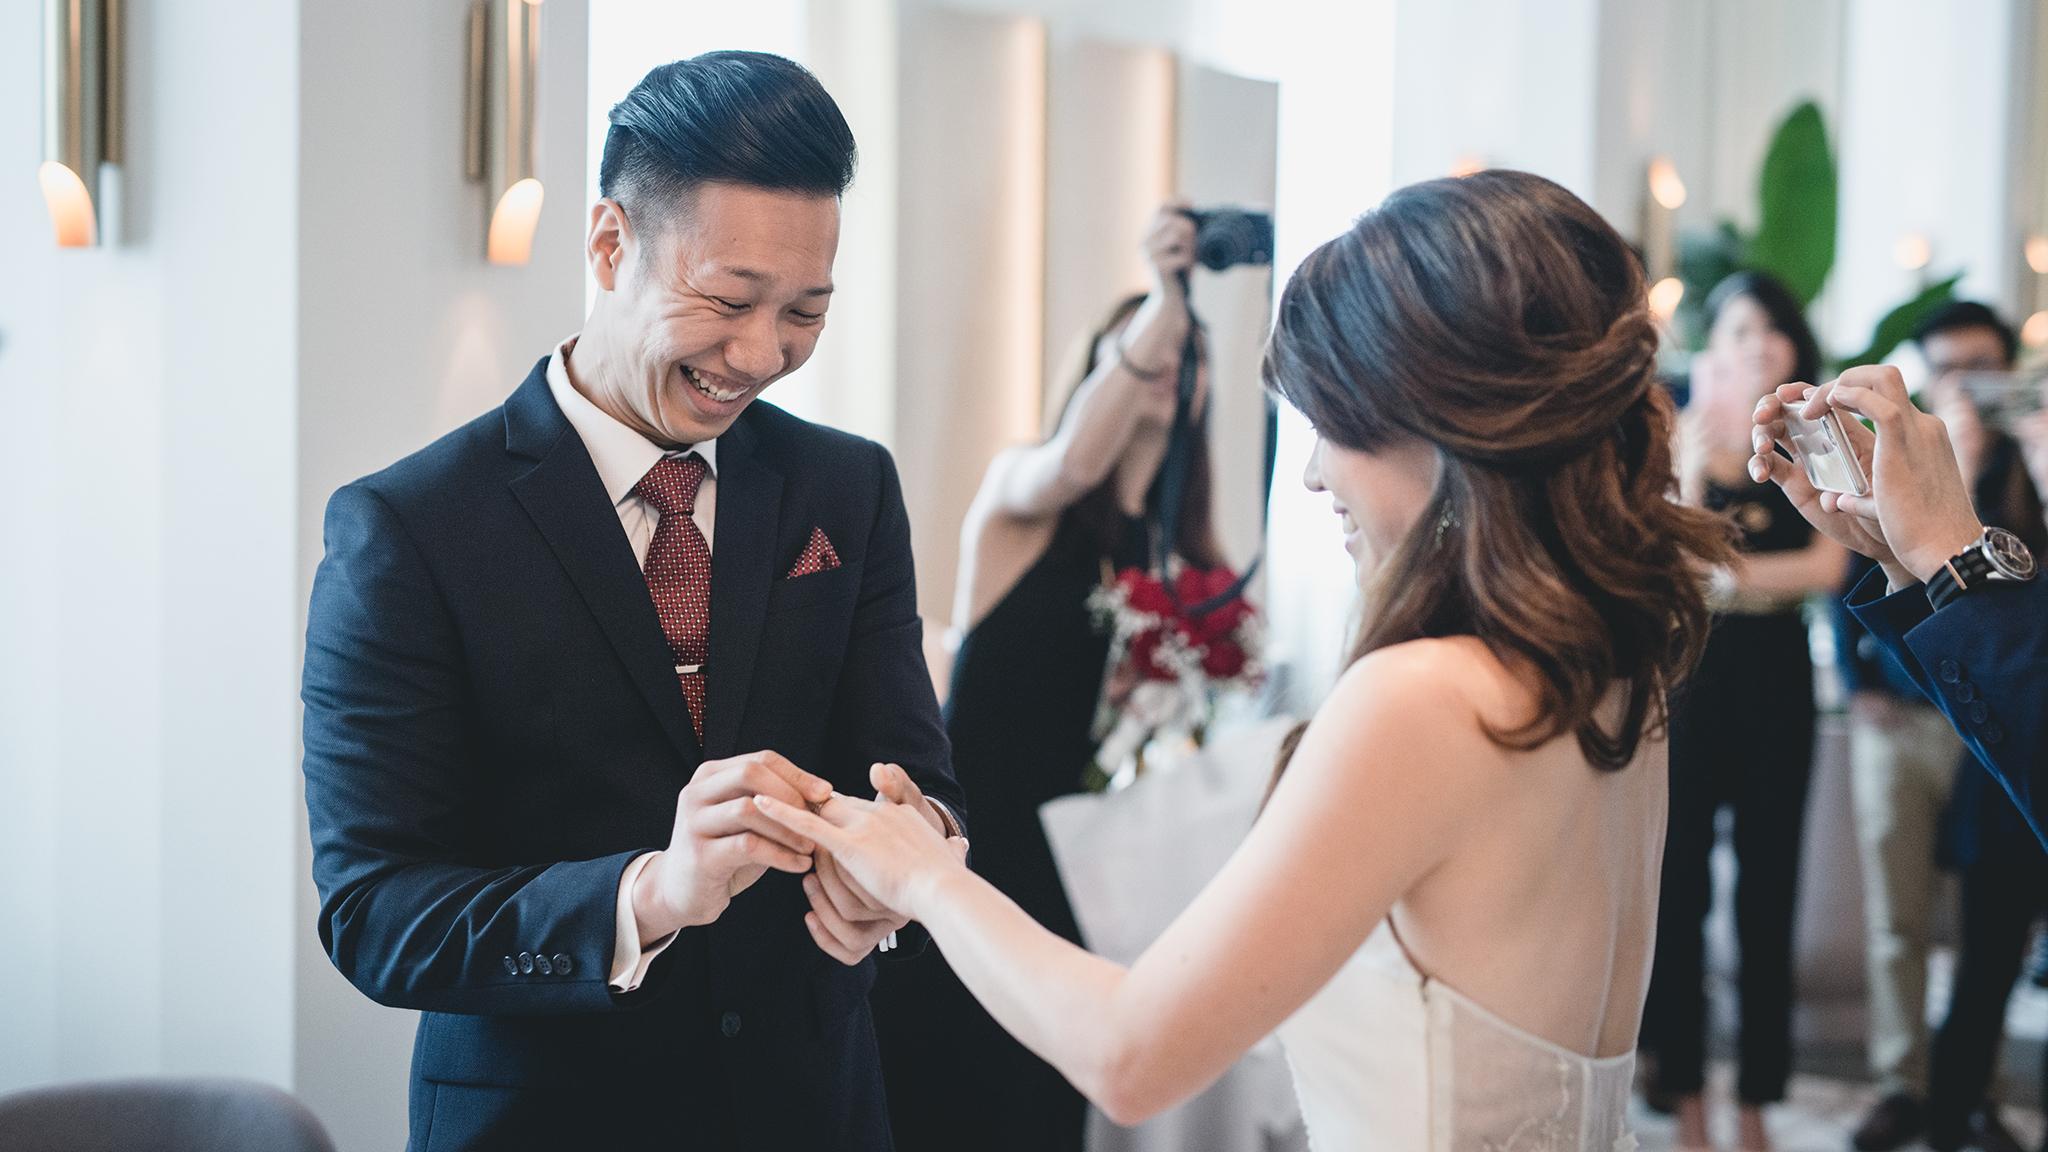 Wedding National Gallery 36.JPG